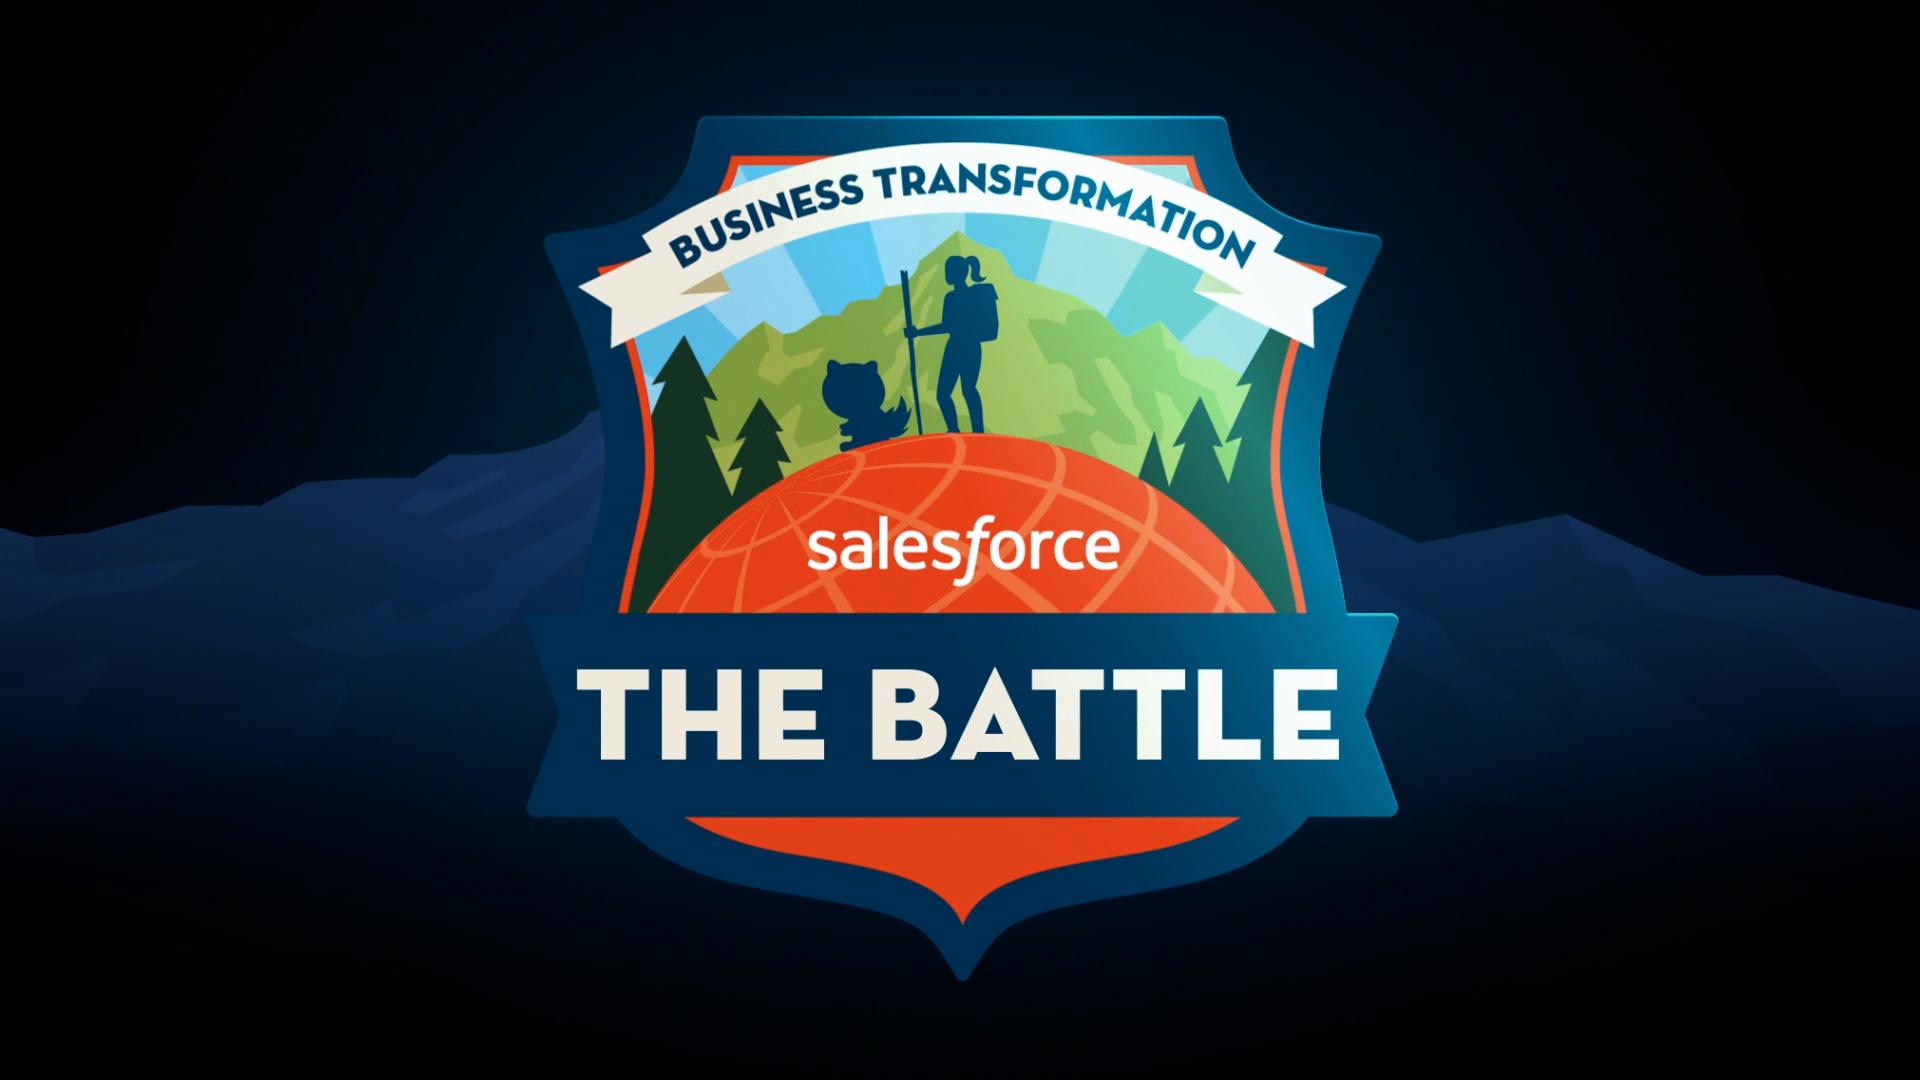 Salesforce The Battle Corporate Video